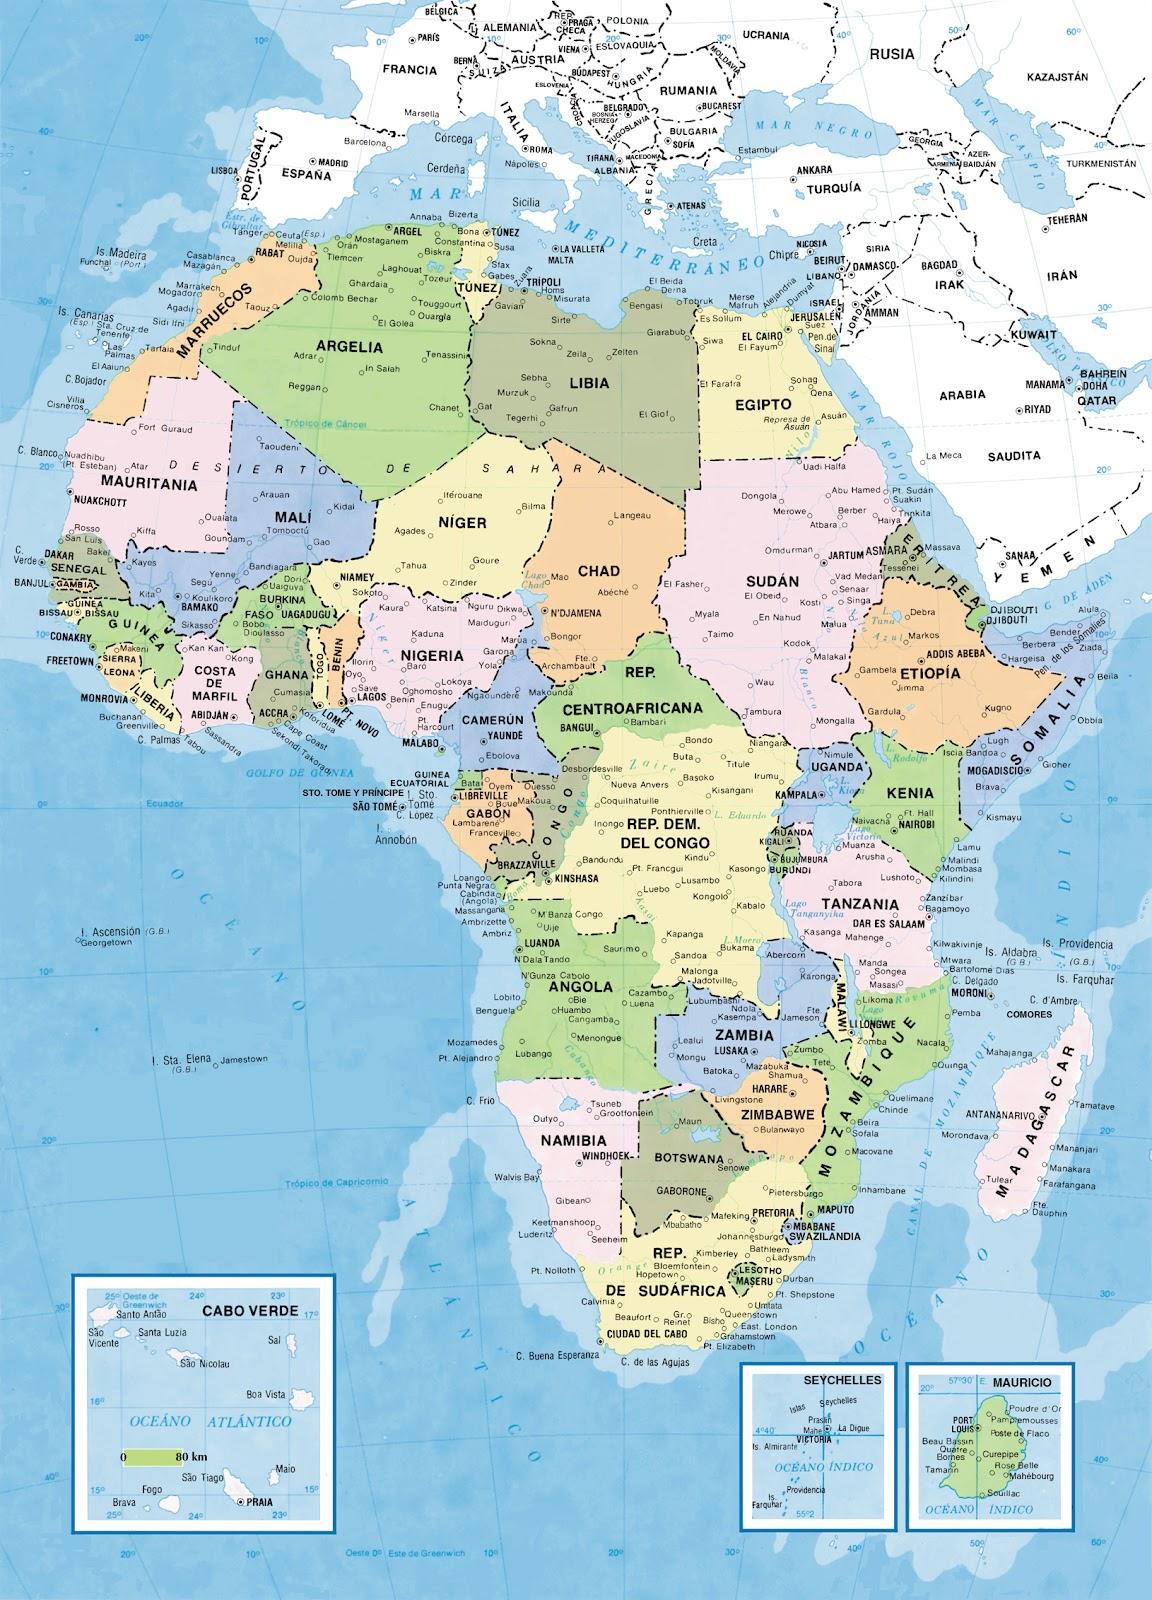 egipto mapa EGIPTO: ¿Dónde se encuentra Egipto? egipto mapa